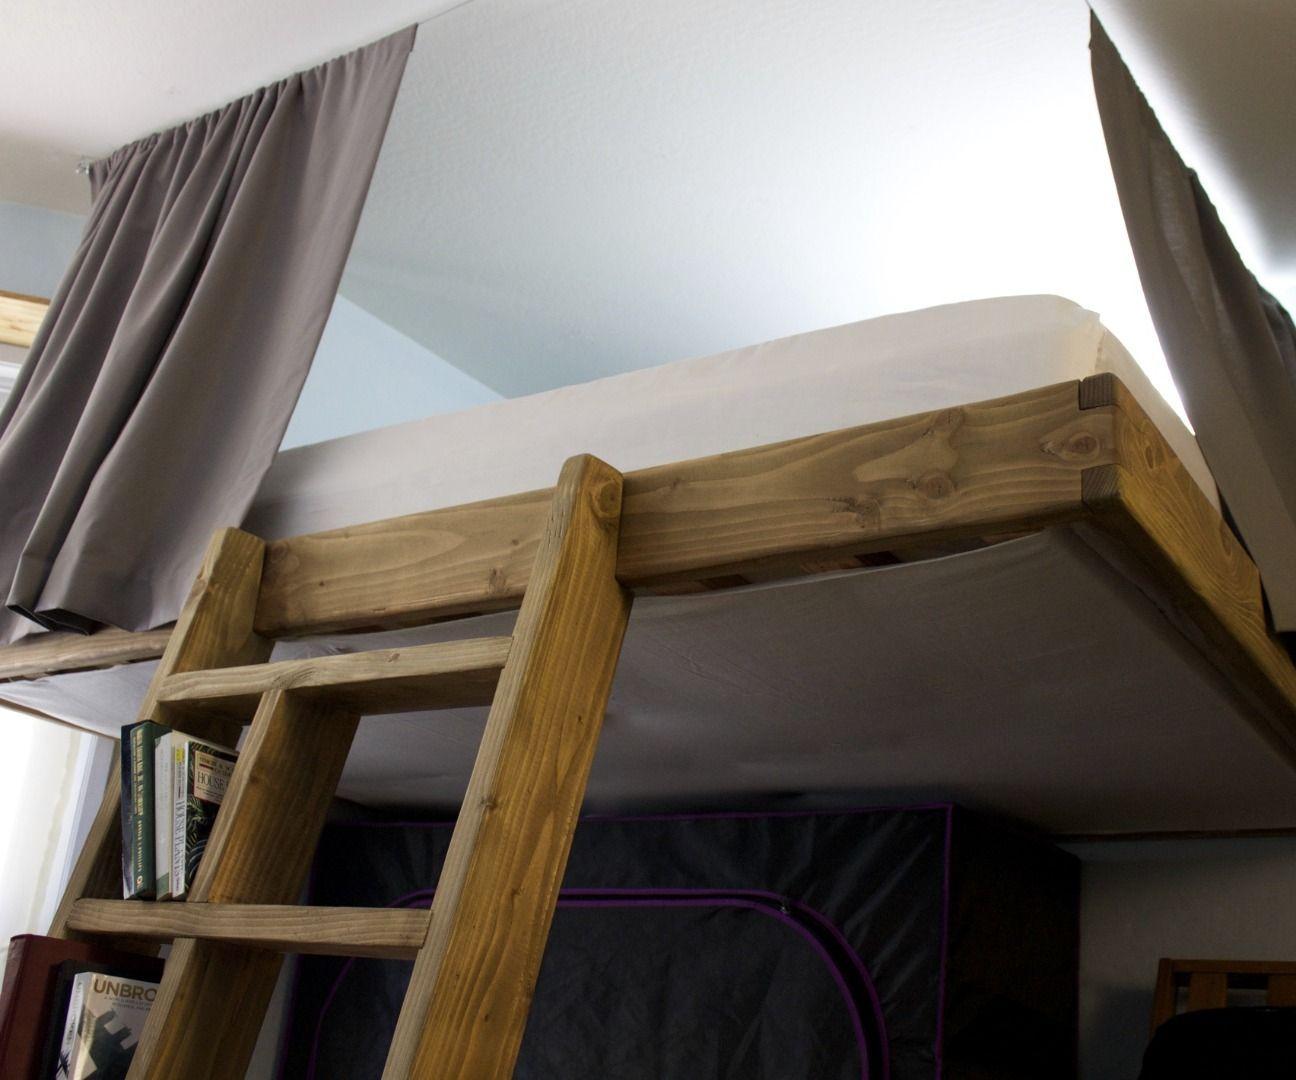 Partially Freestanding Loft Bed Under 50 Loft bed plans